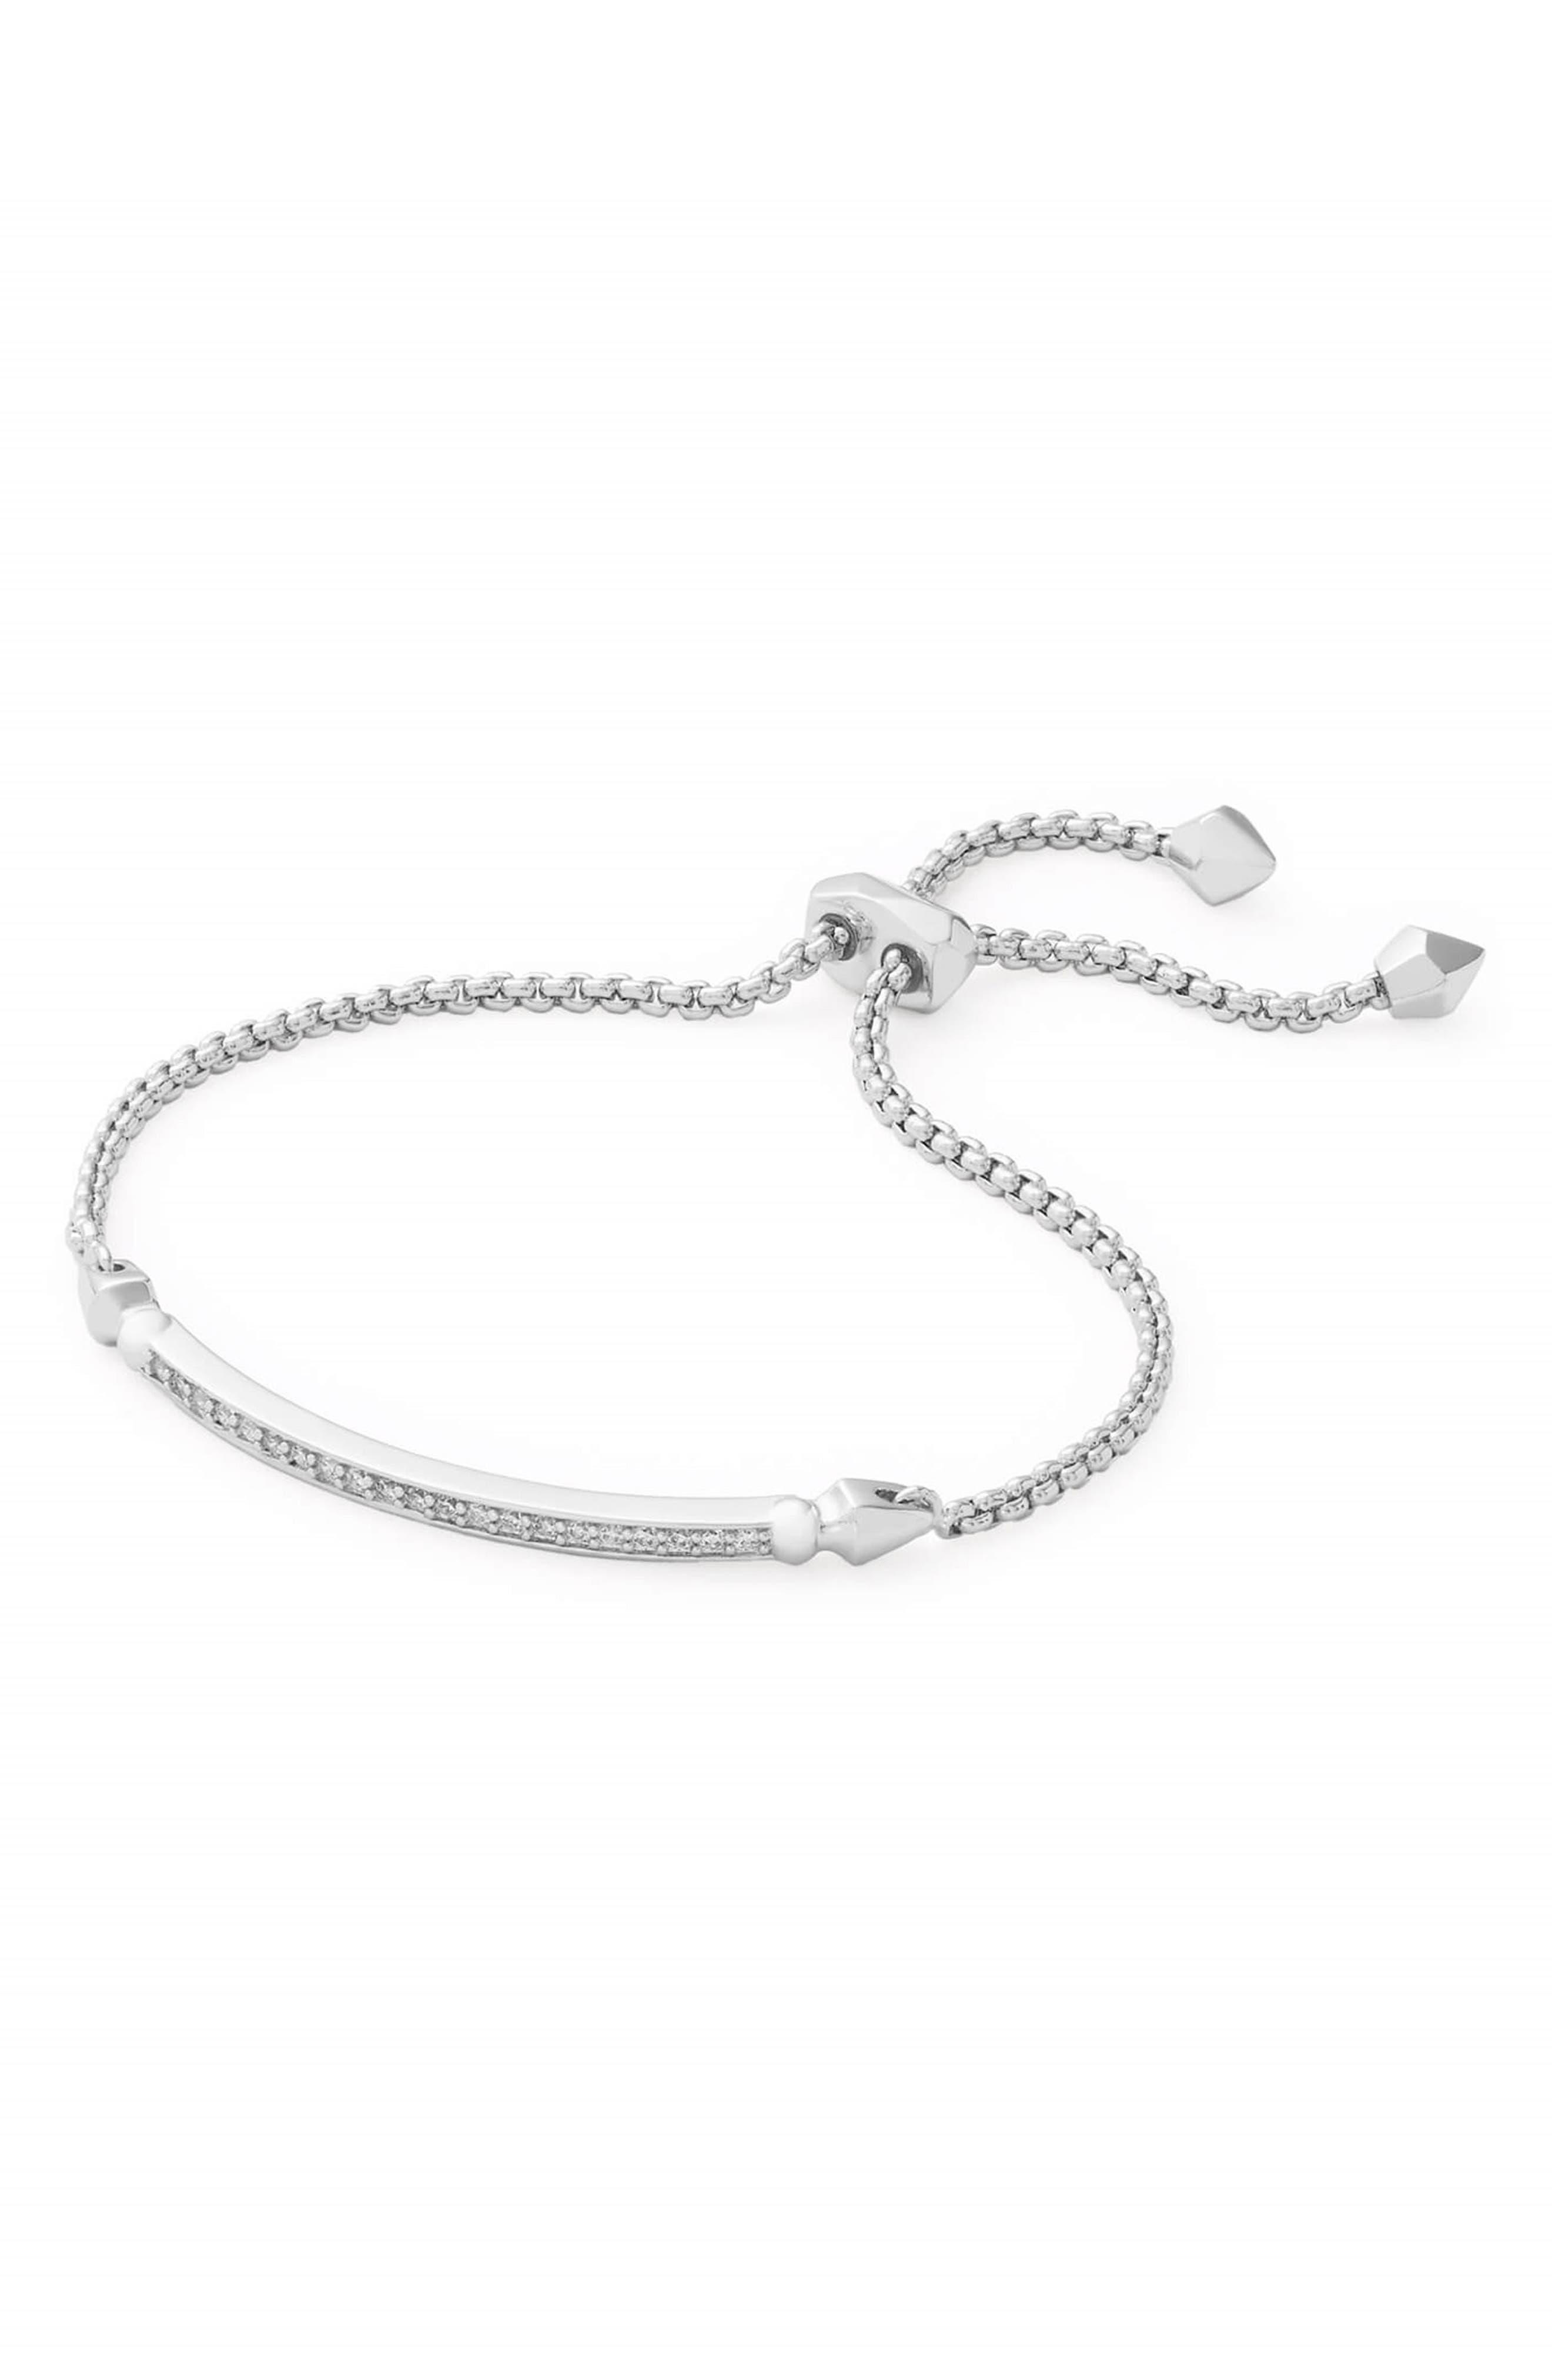 KENDRA SCOTT Ott Friendship Bracelet, Main, color, SILVER